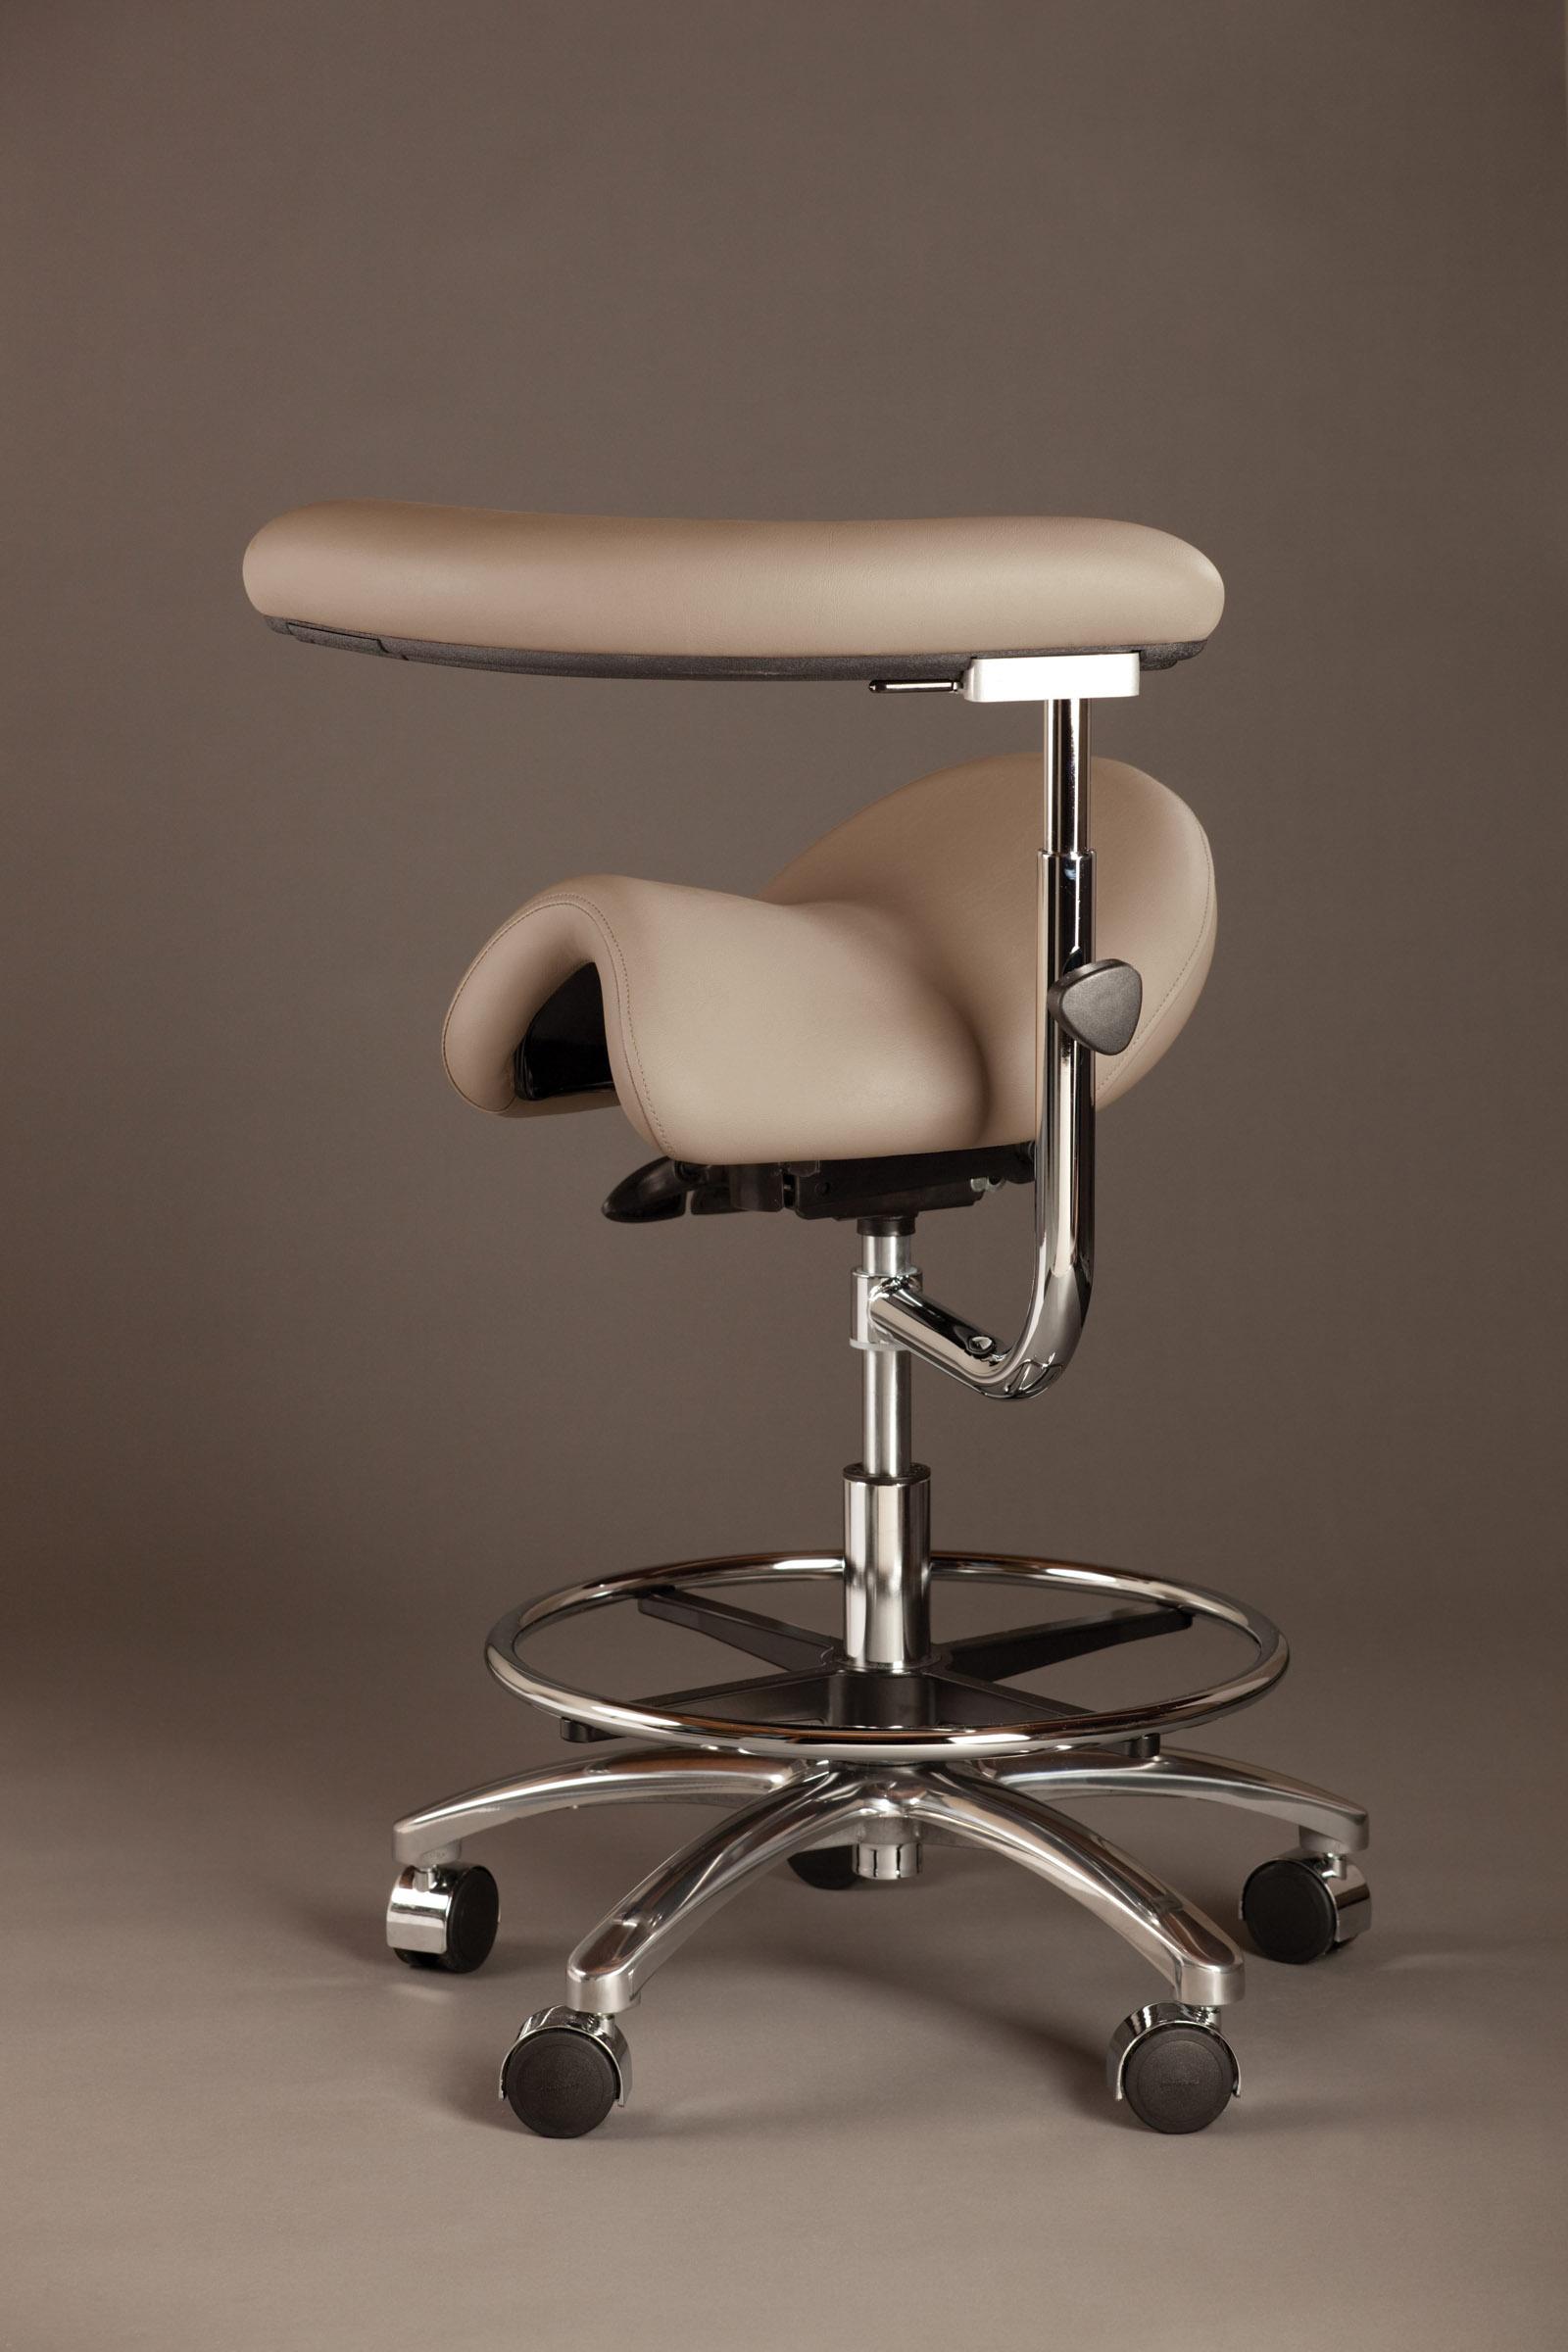 dental saddle chair